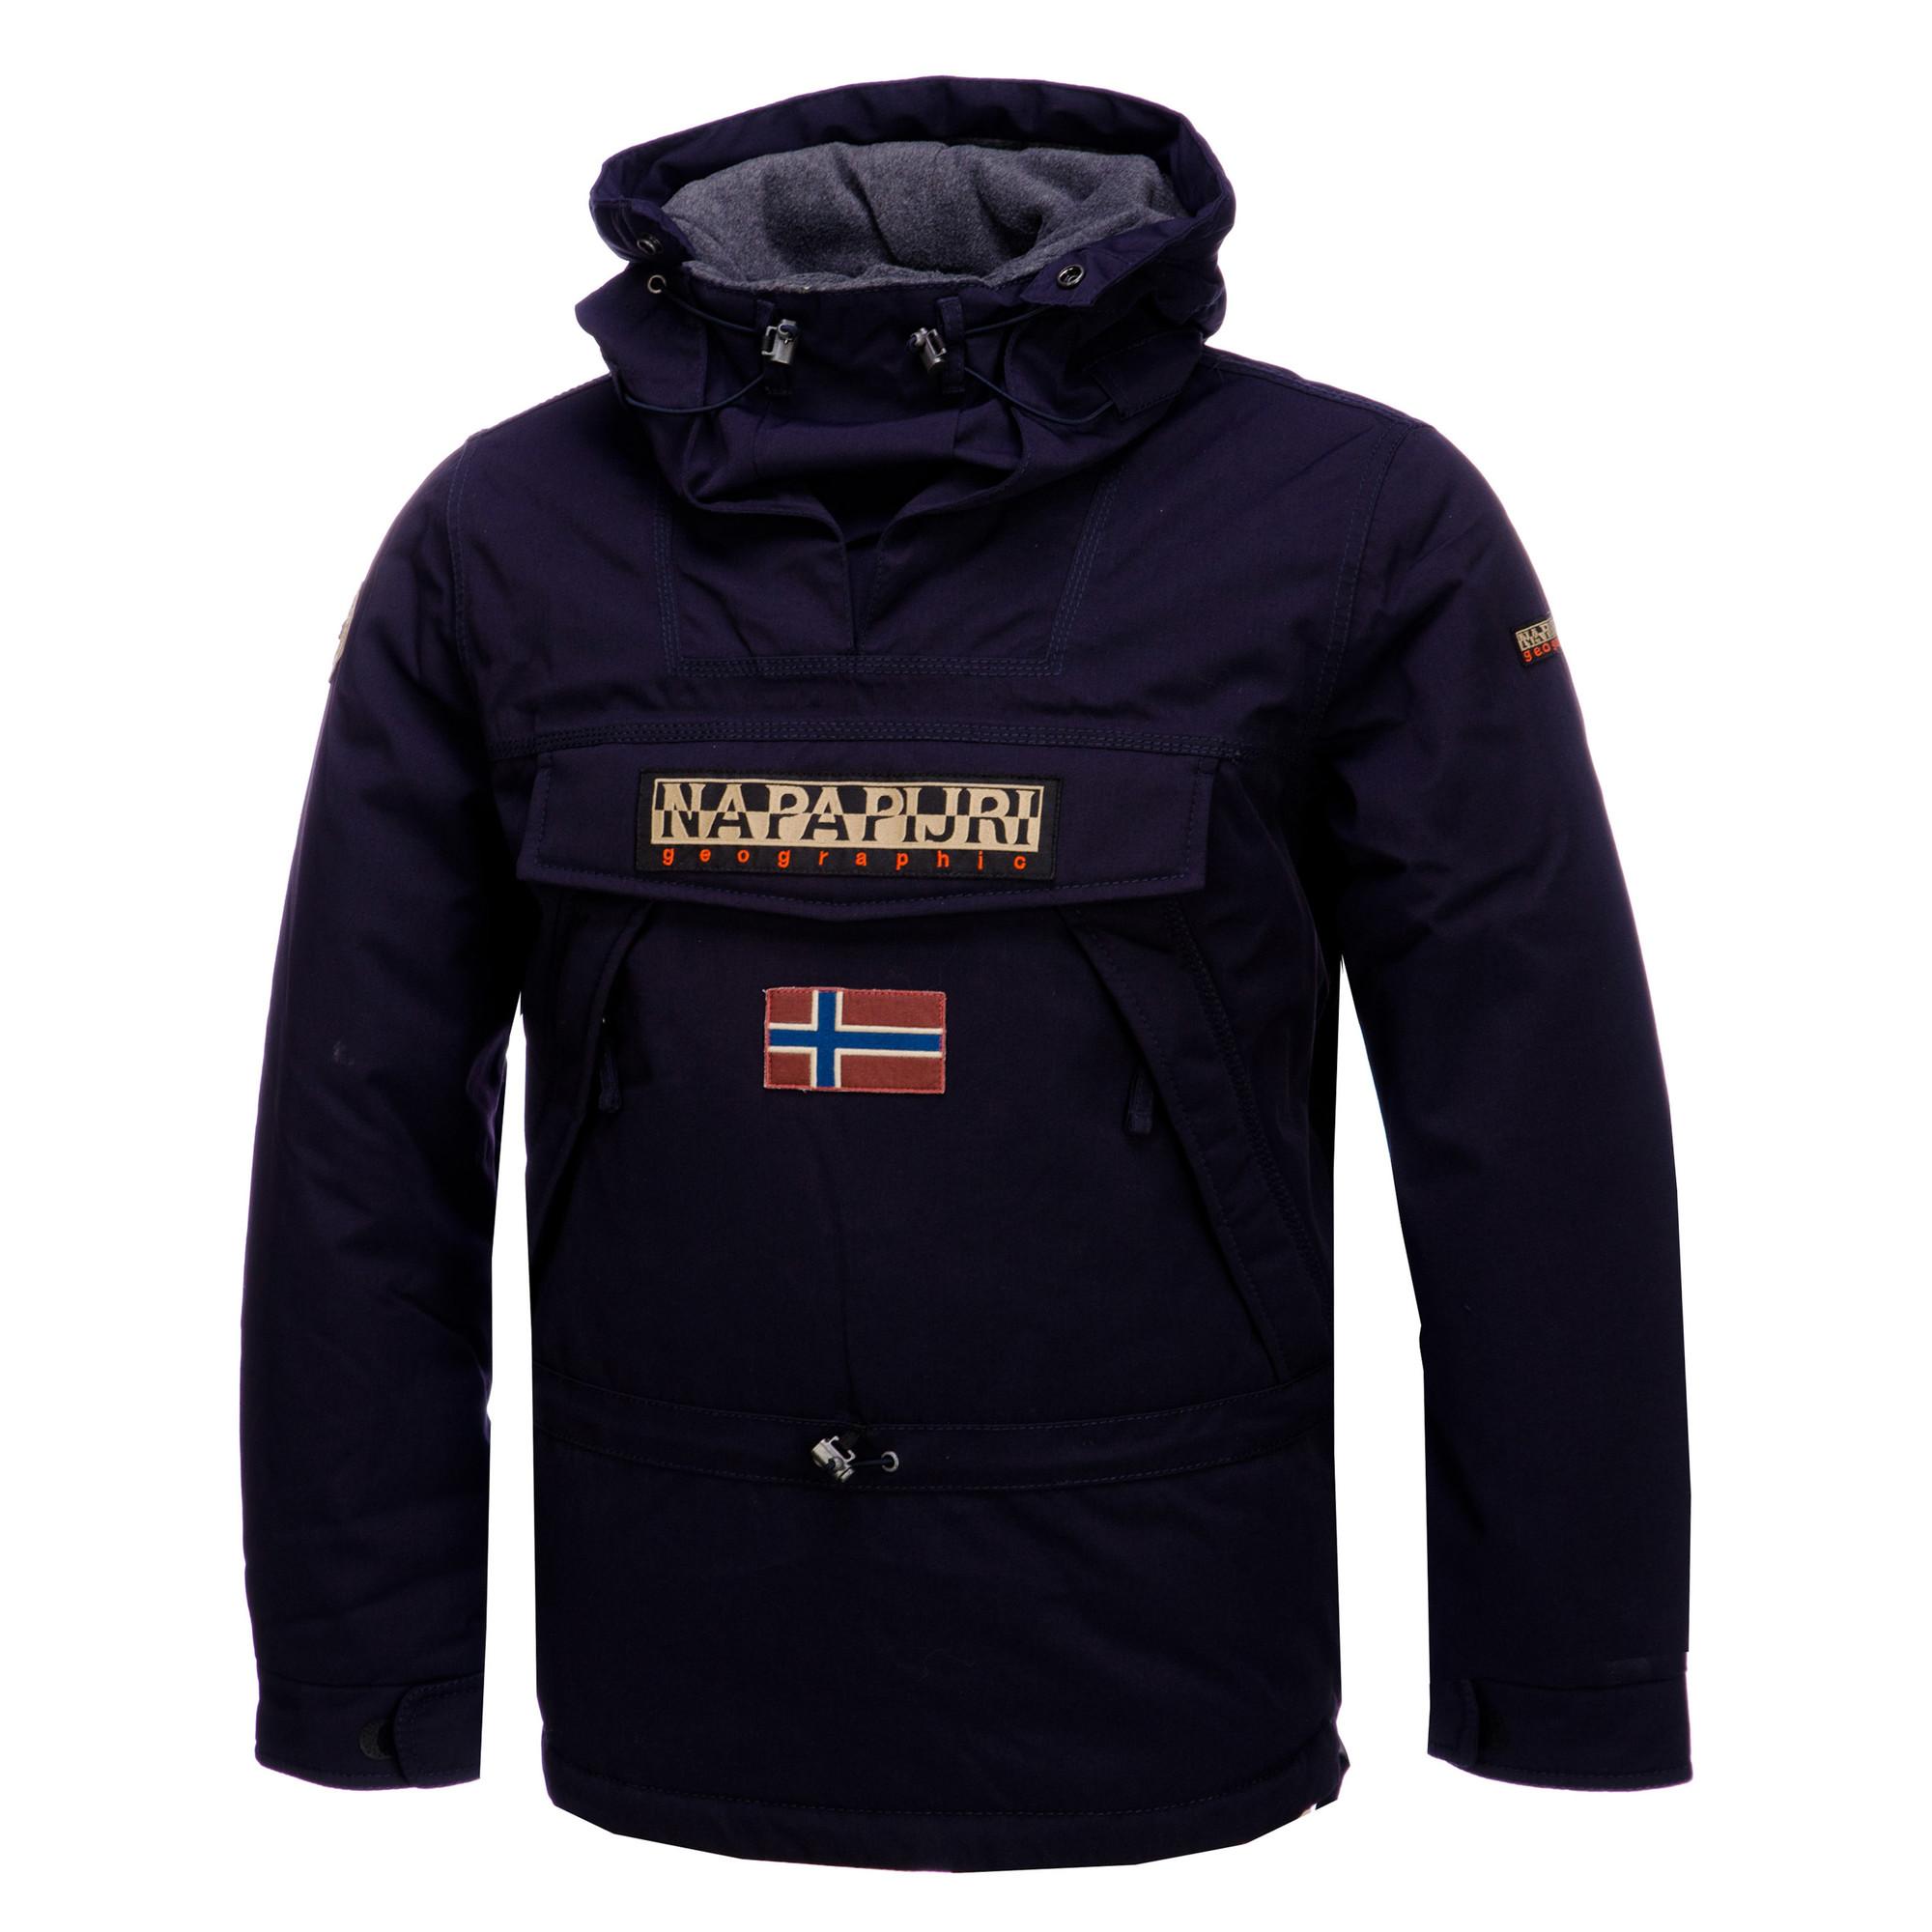 https://www.skiwebshop.com/media/catalog/product/n/a/napapijri_skidoo_14_heren_ski-jas_marine_blauw_a14mj60a_1-1_2.jpg